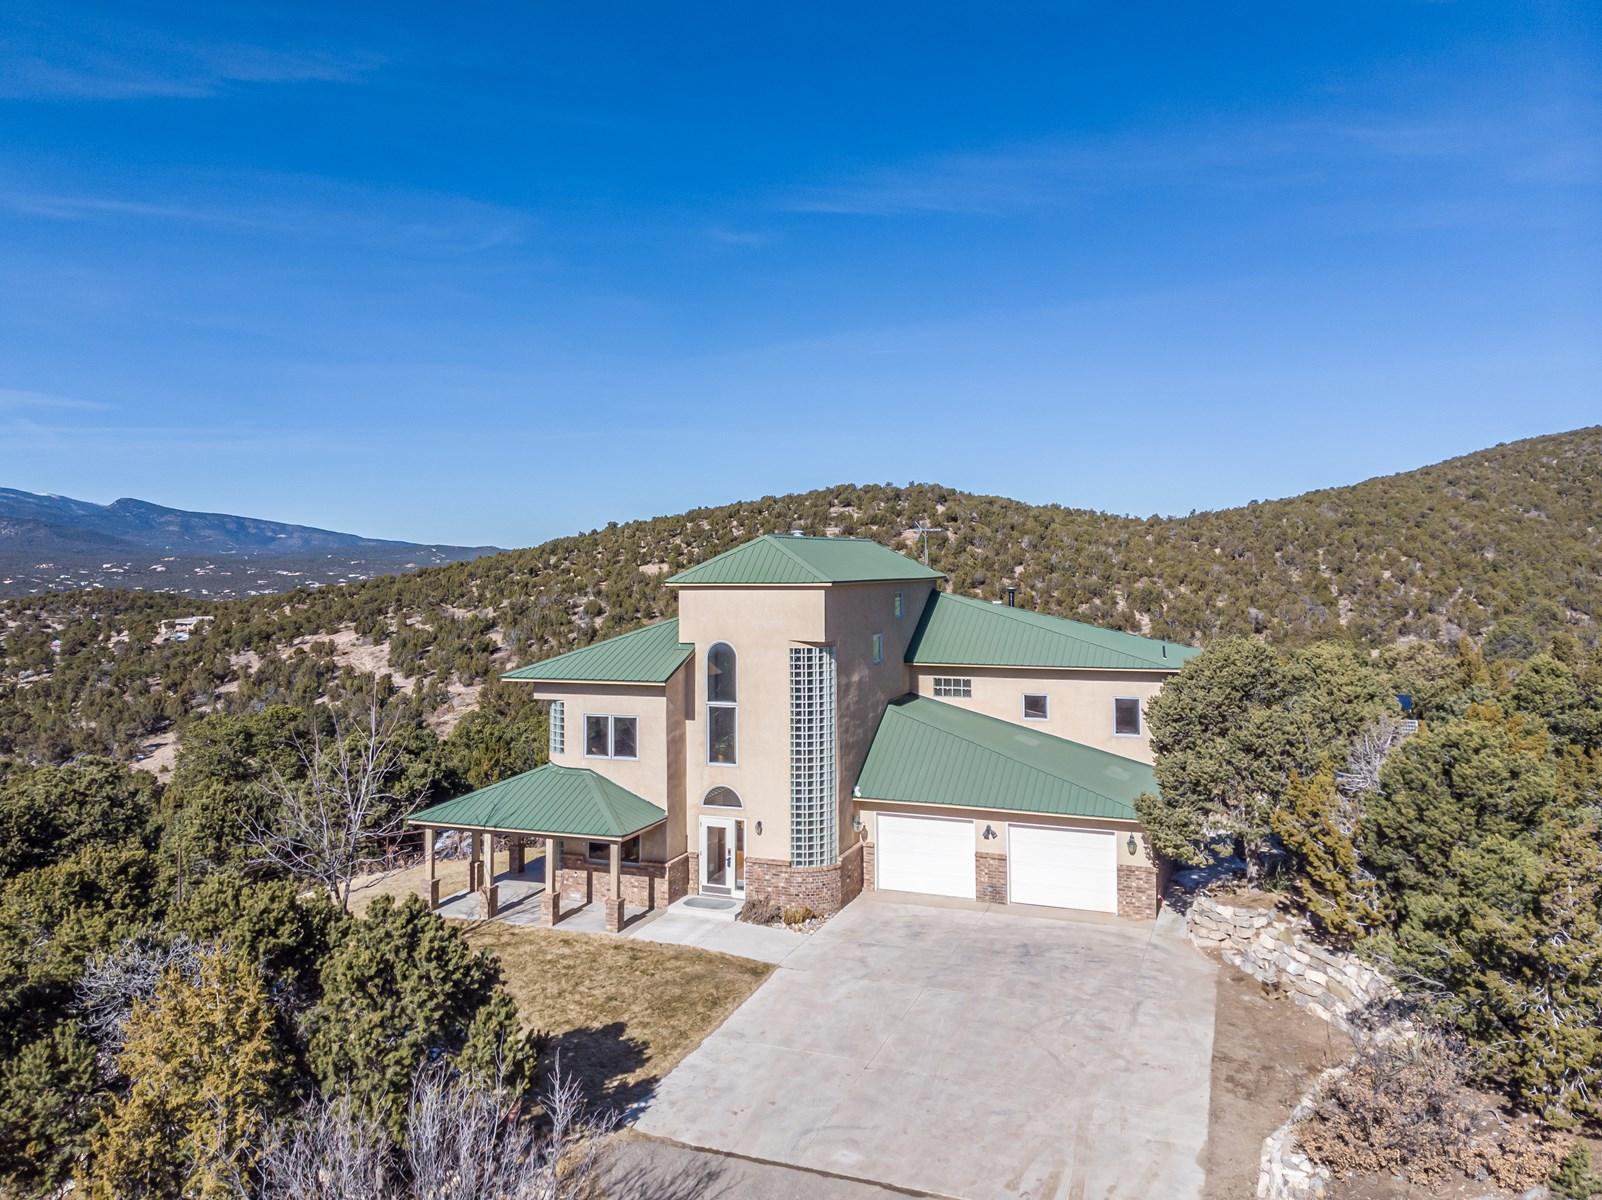 New Mexico Mountain Home On 4.68 Acres For Sale Sandia Park